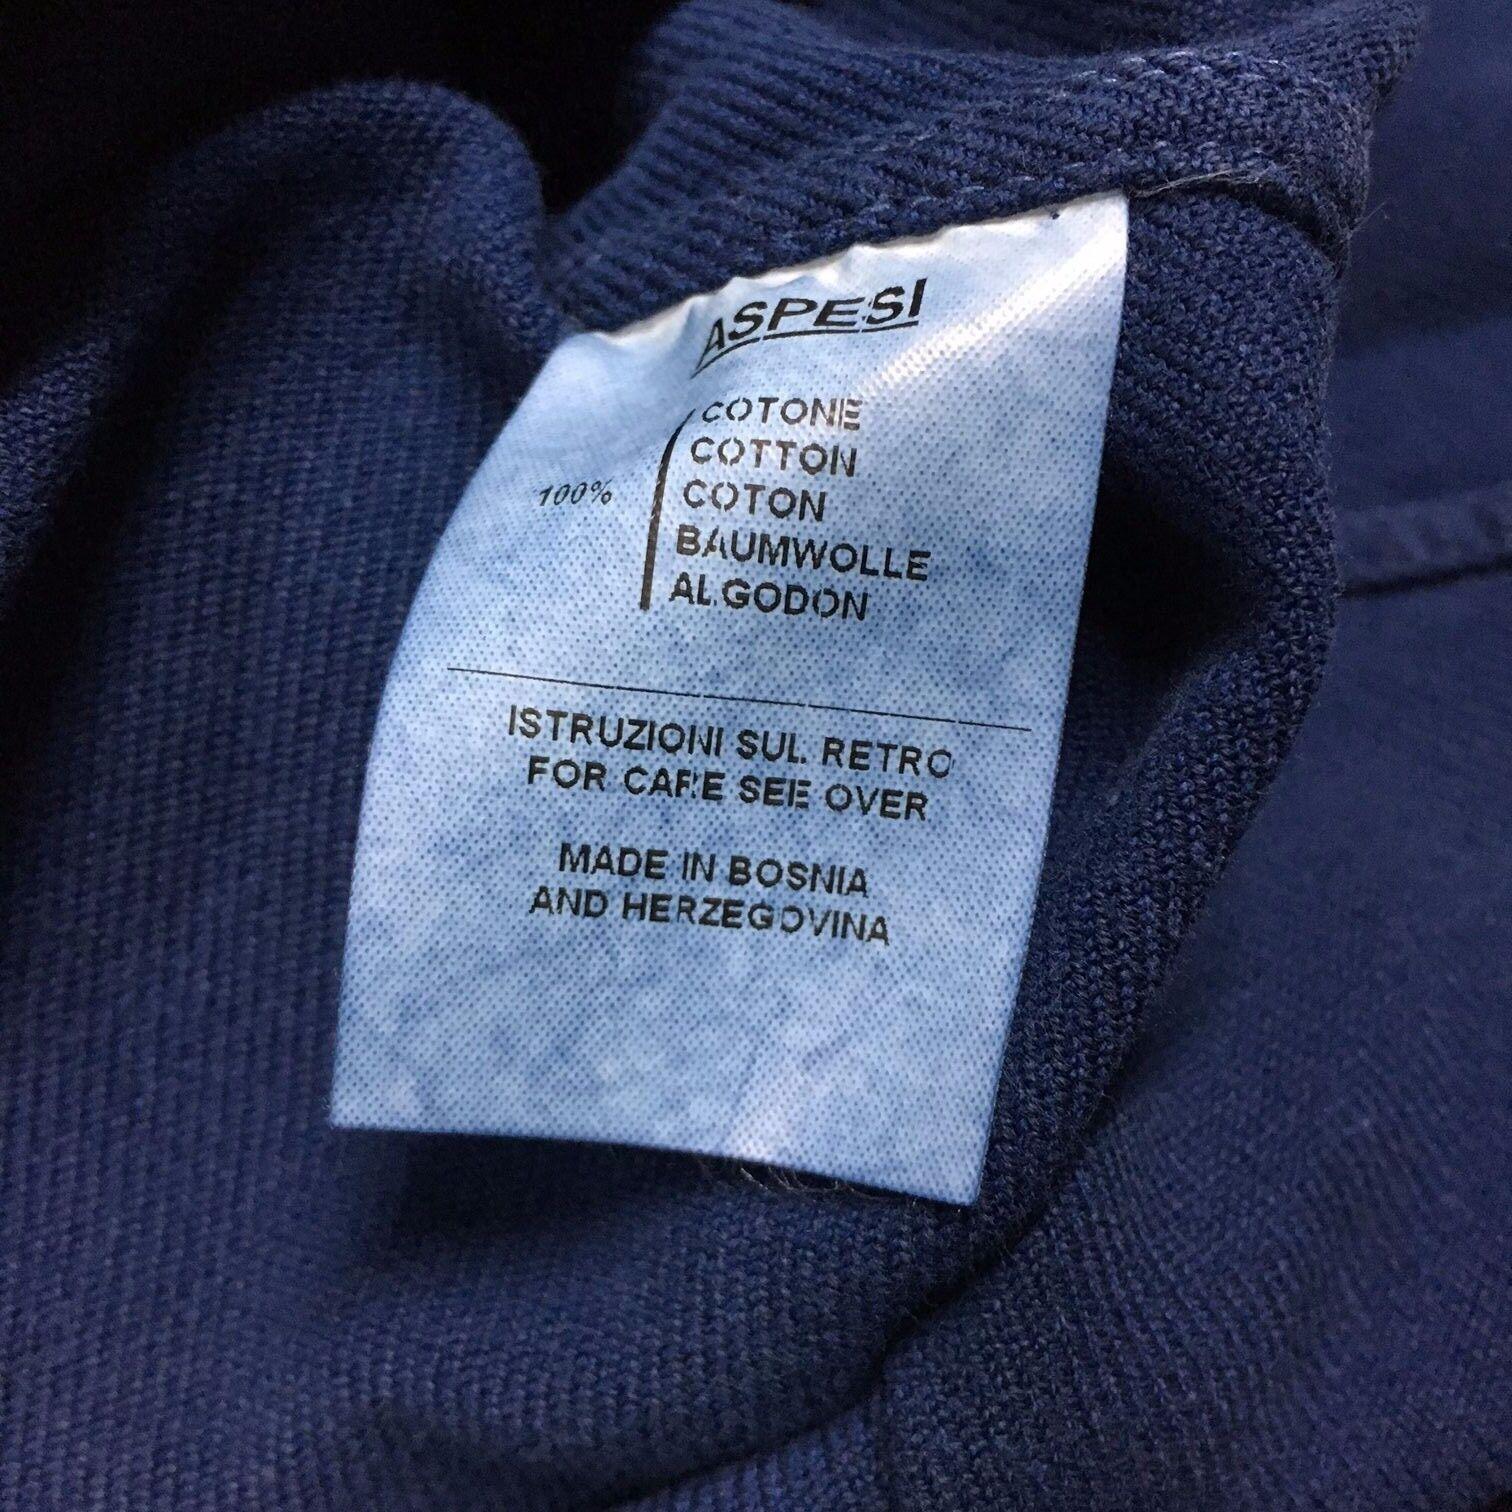 ASPESI Herrenhemd Indigo mod GASOLINA I6 A A A CE74 E742 100% Baumwolle 3b46d5